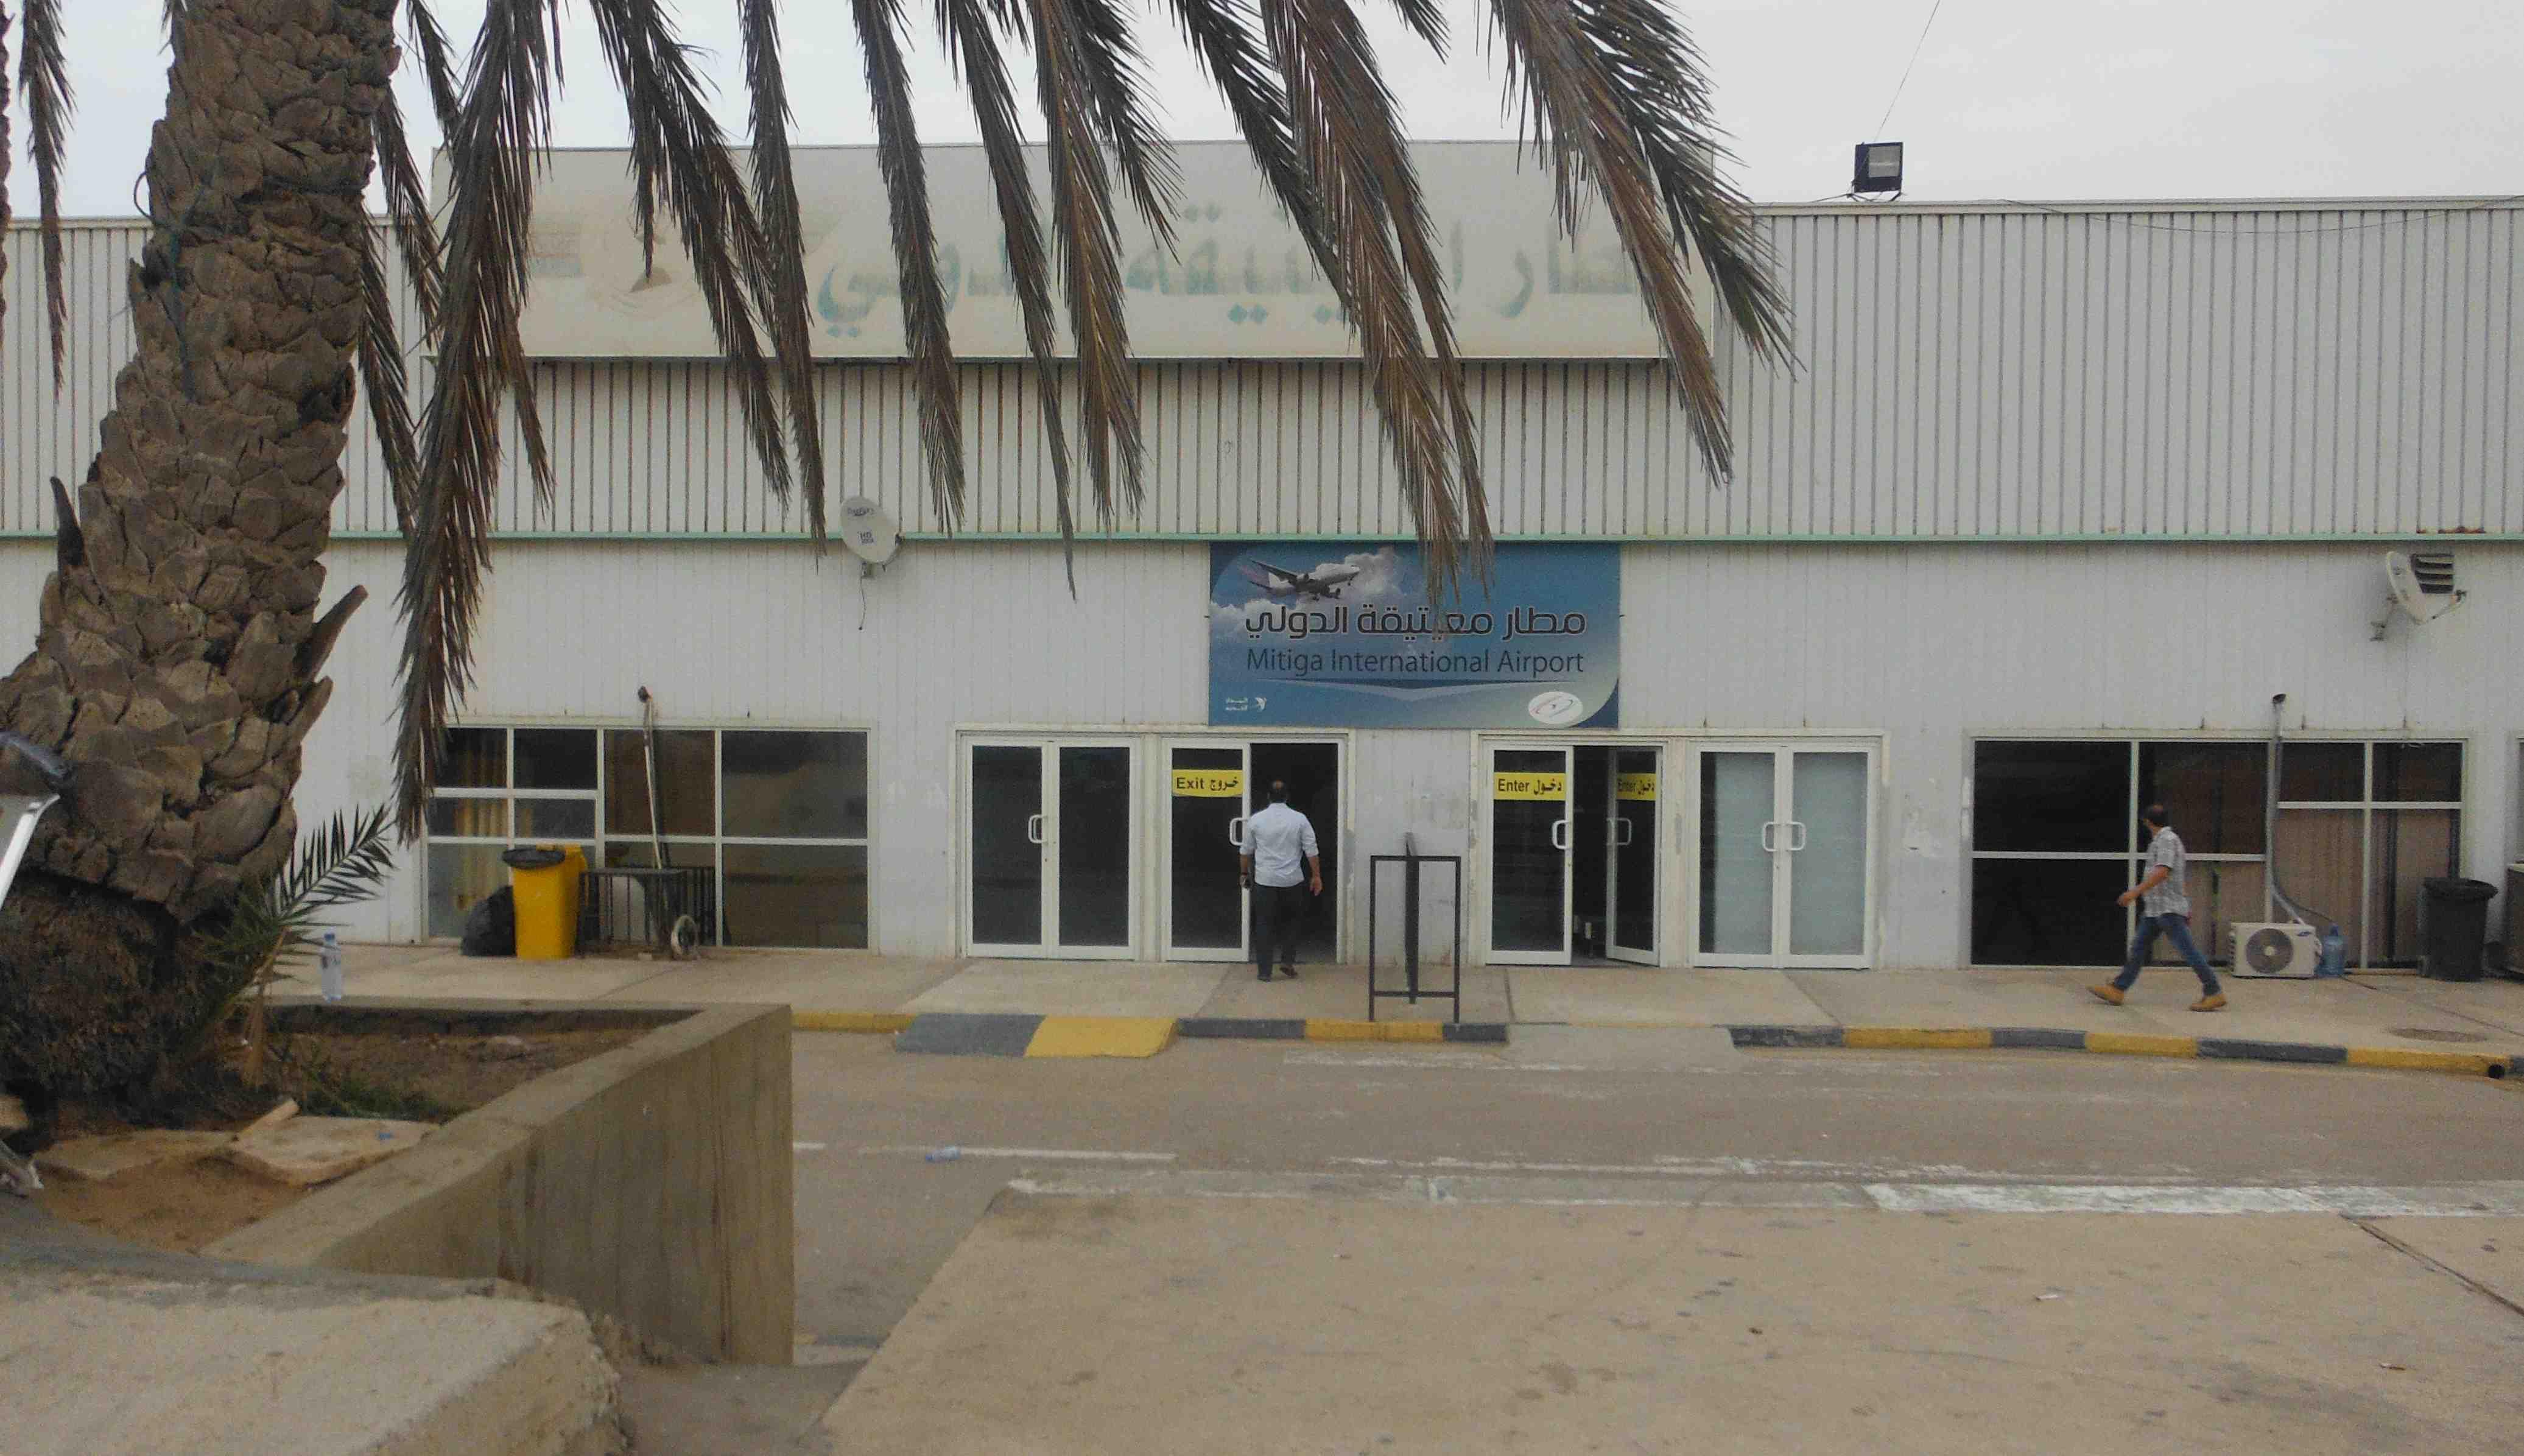 Mitiga Airport Reopens After Gunfire Causes Short Closure